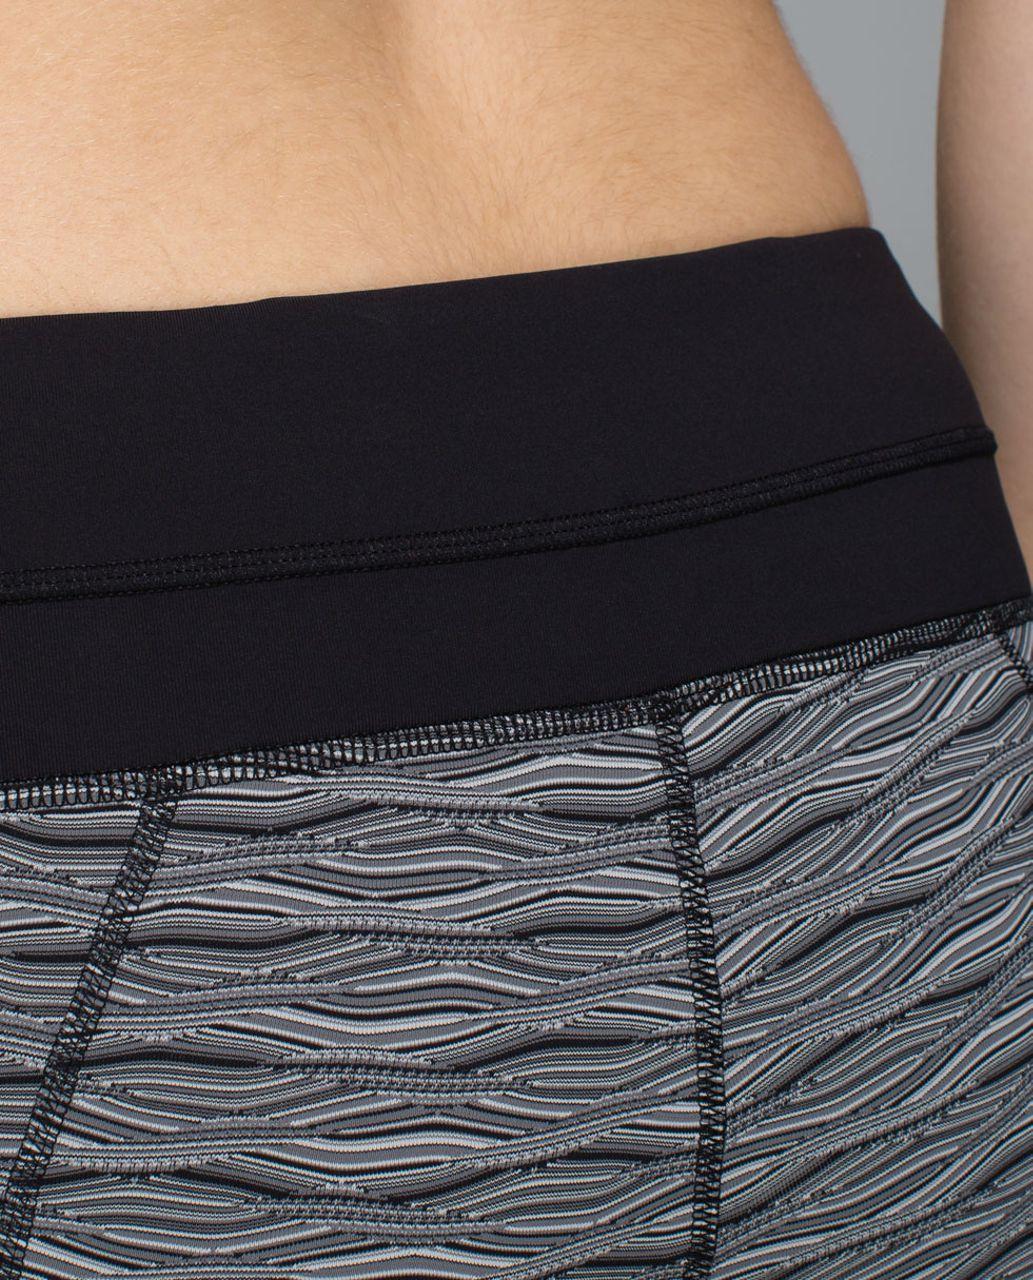 Lululemon Inspire Tight II - Textured Wave Black Silver Spoon / Black